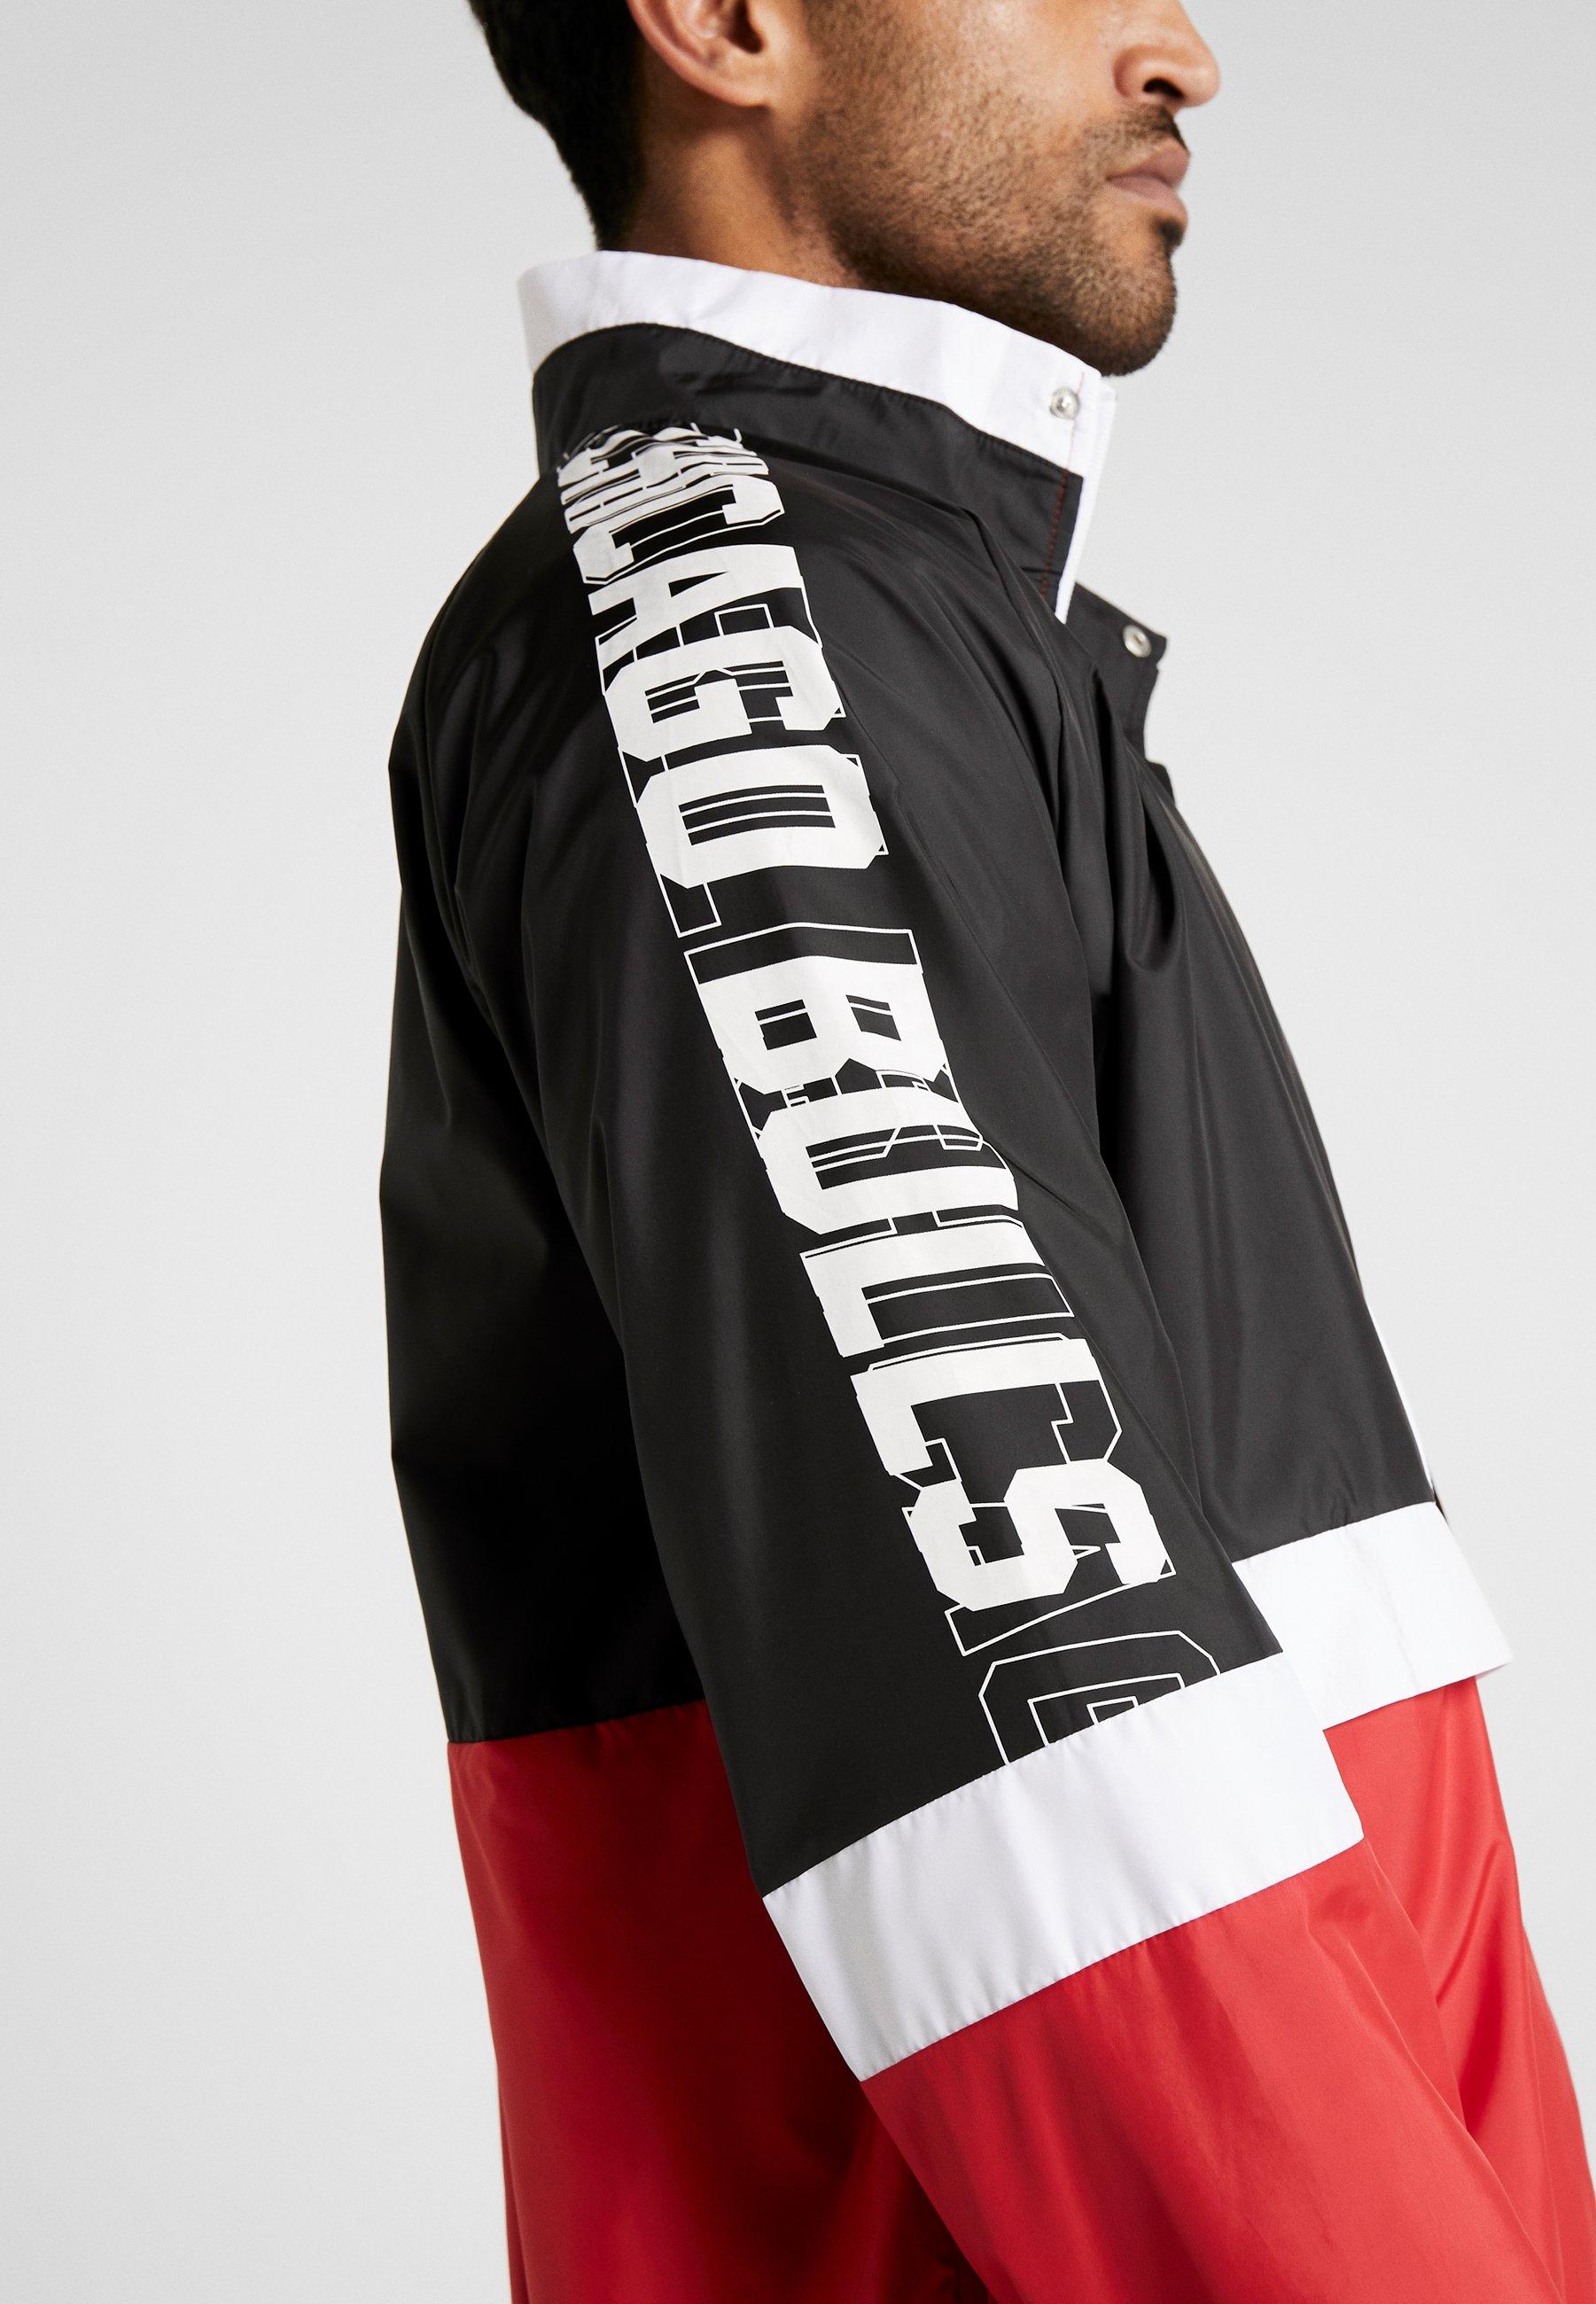 Door optic Track Black Red Nba BullsSquadra Colour Era Block White Jacket New Chicago front H2YWD9EI